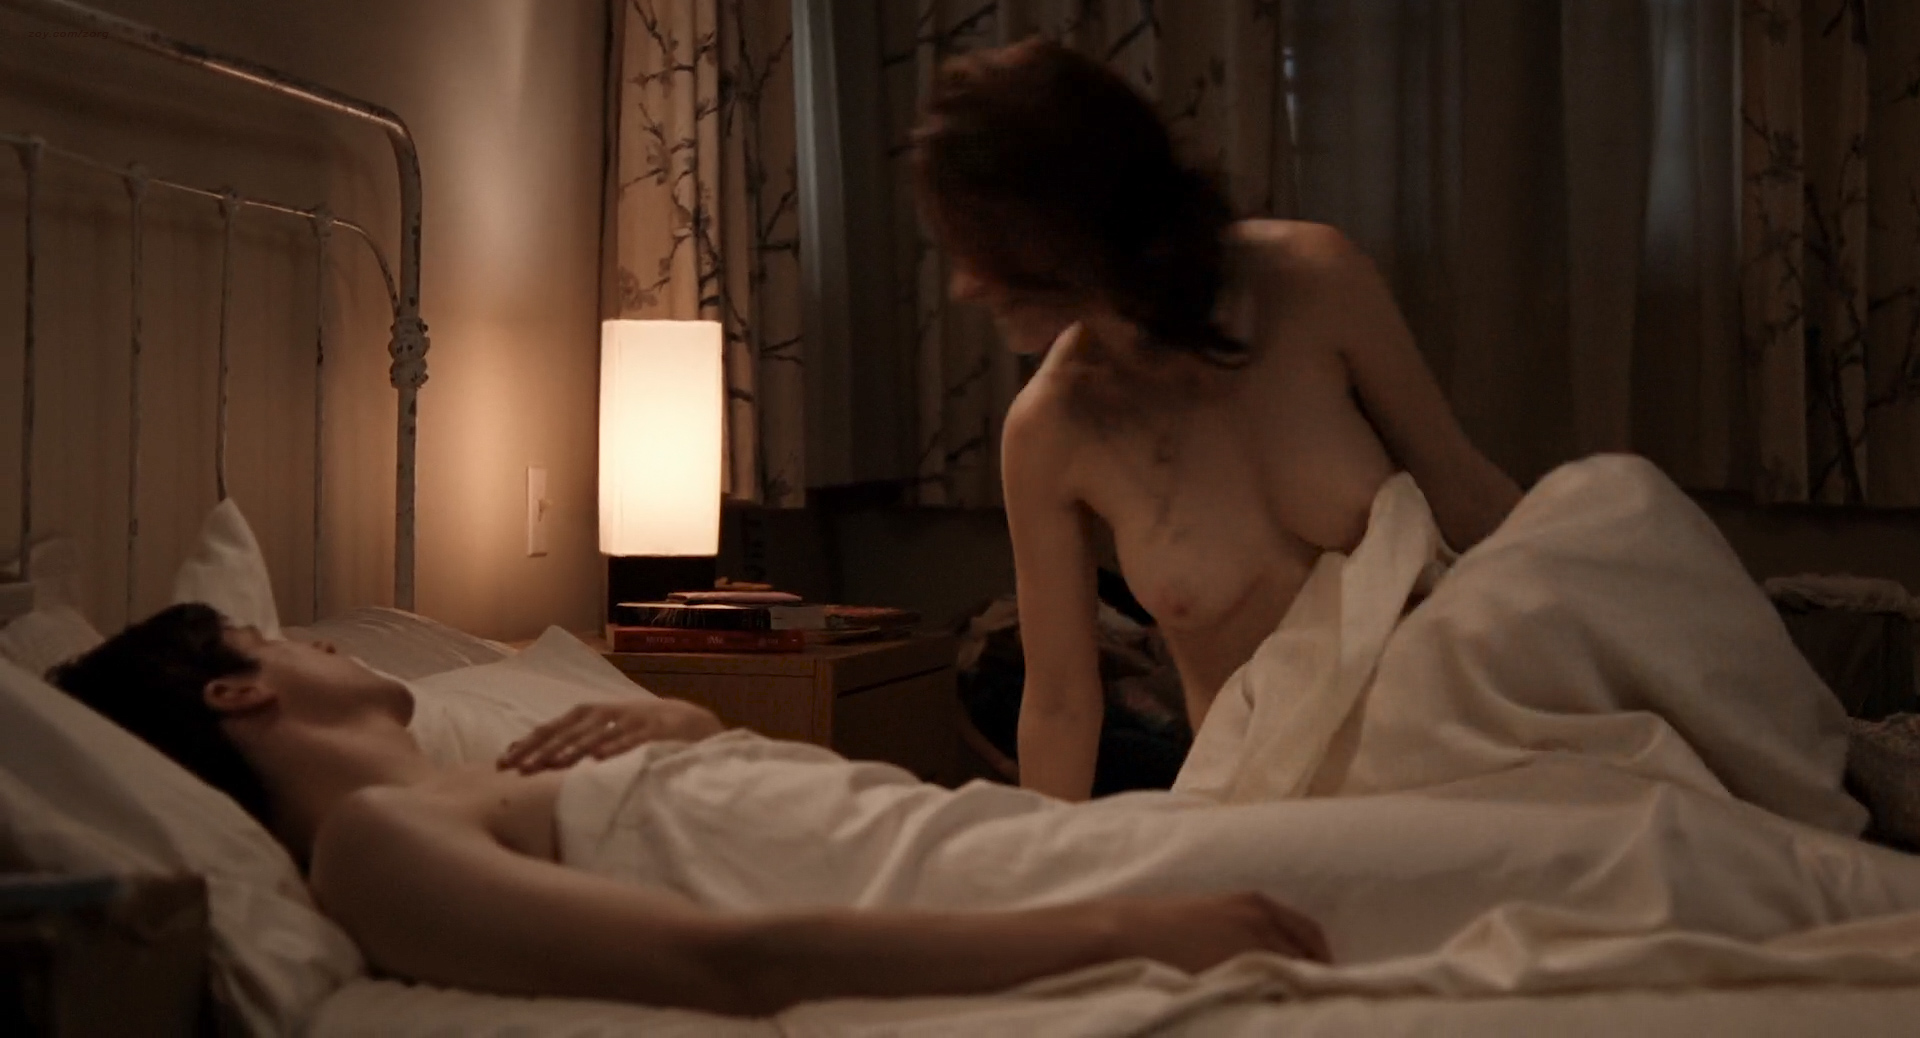 Rachel-Brosnahan-nude-topless-Louder-Than-Bombs-2015-HD-1080p-WEB-DL-2.jpg